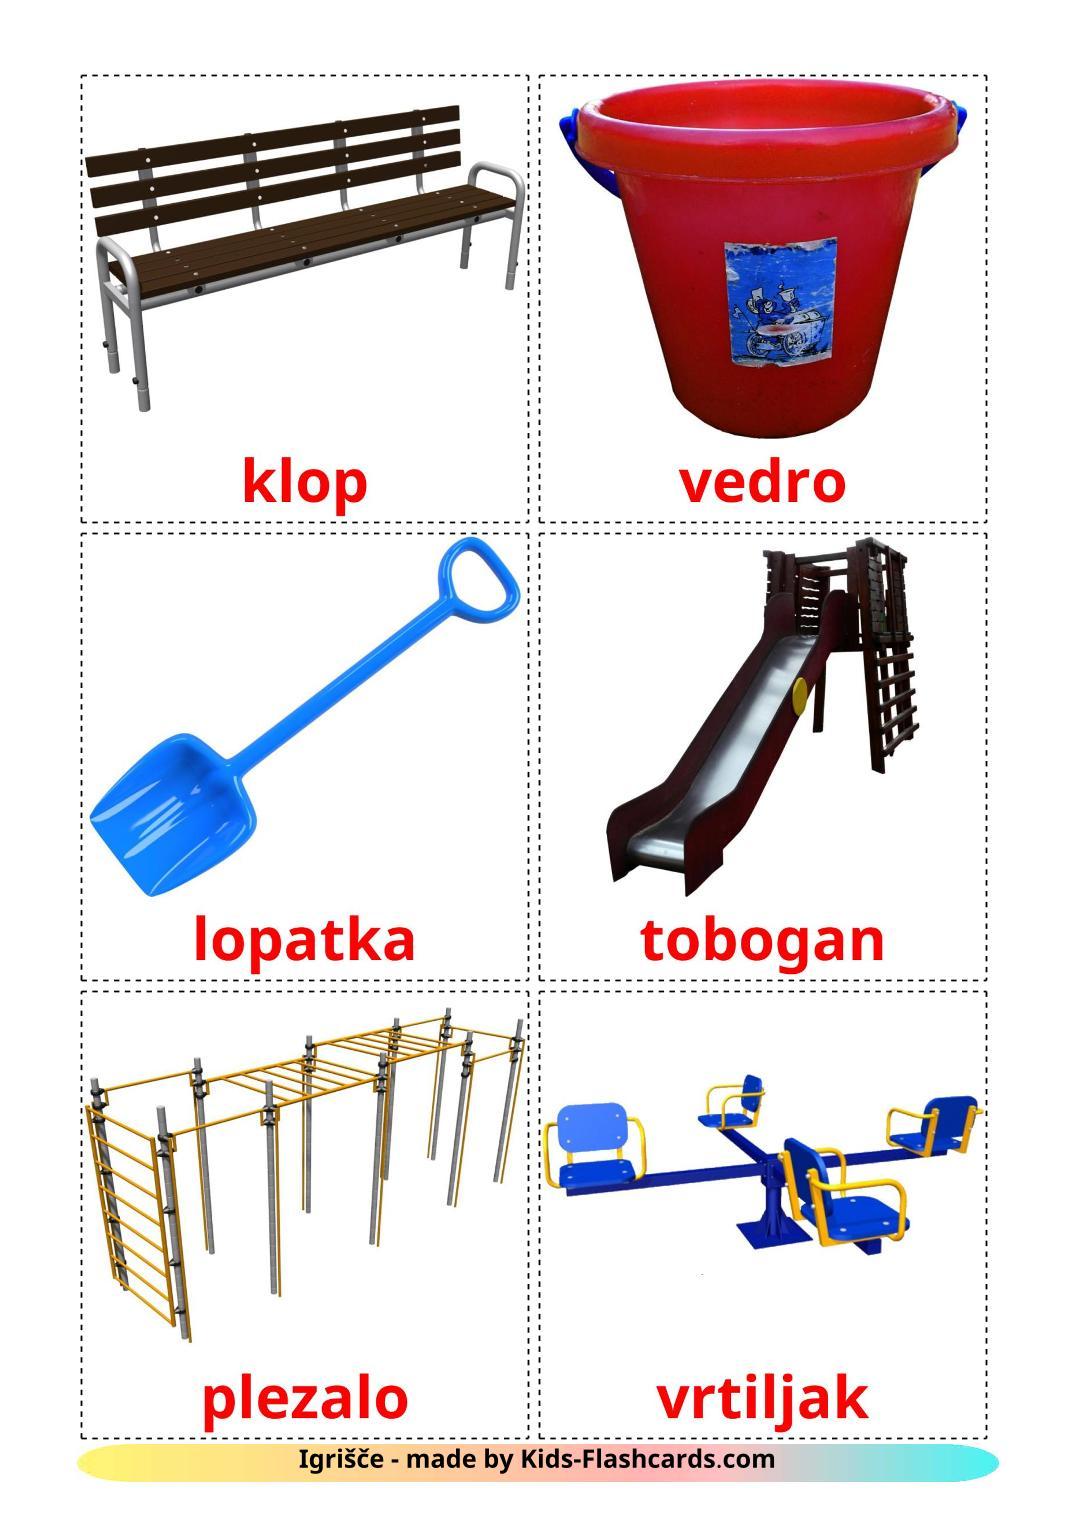 Playground - 13 Free Printable slovenian Flashcards